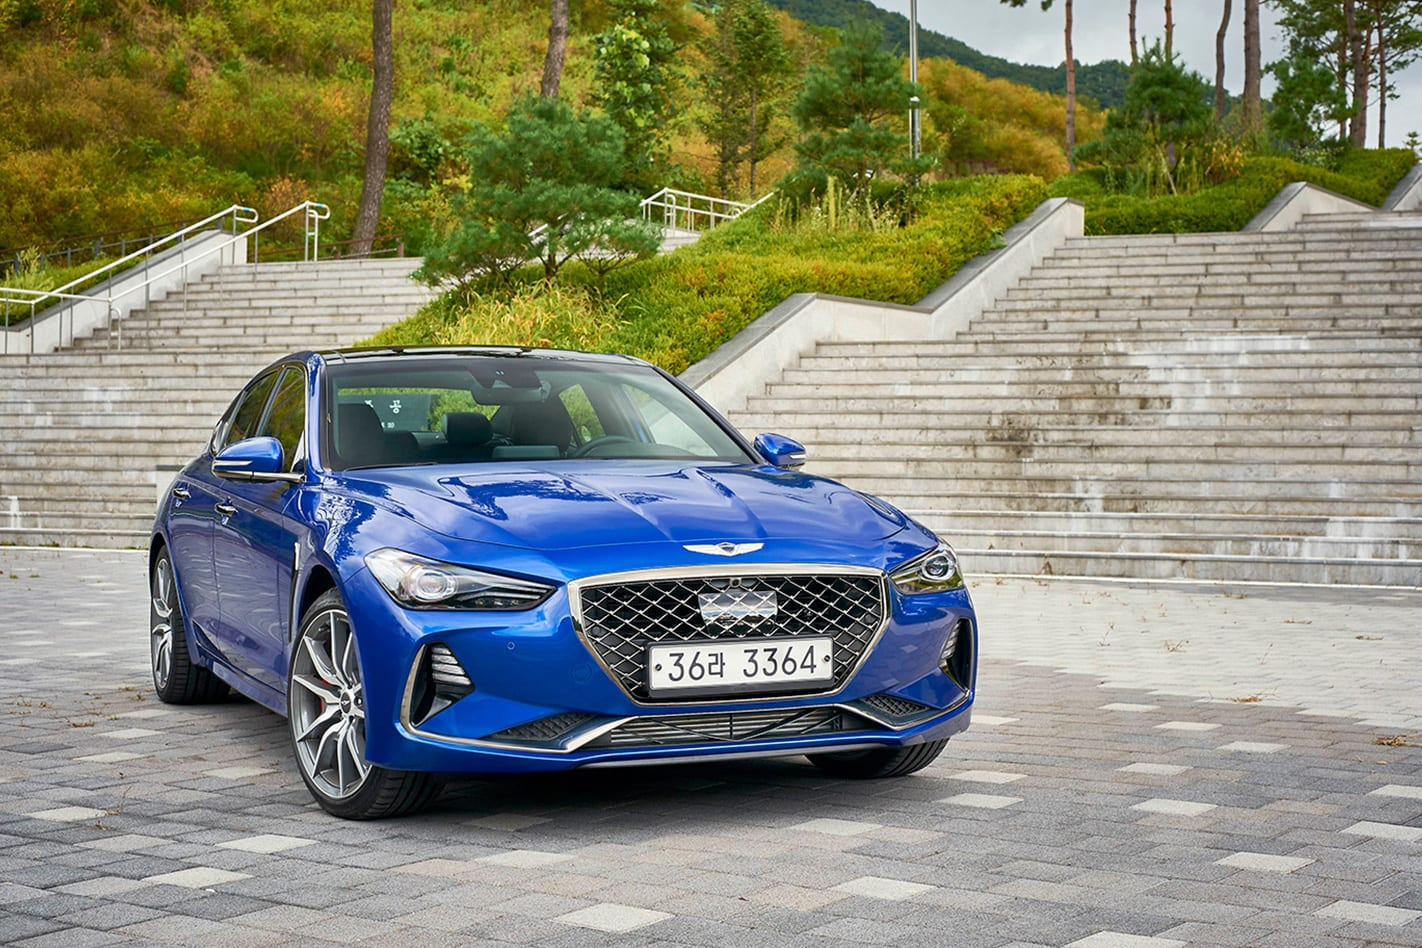 2018-Hyundai-Genesis-G70-front.jpg